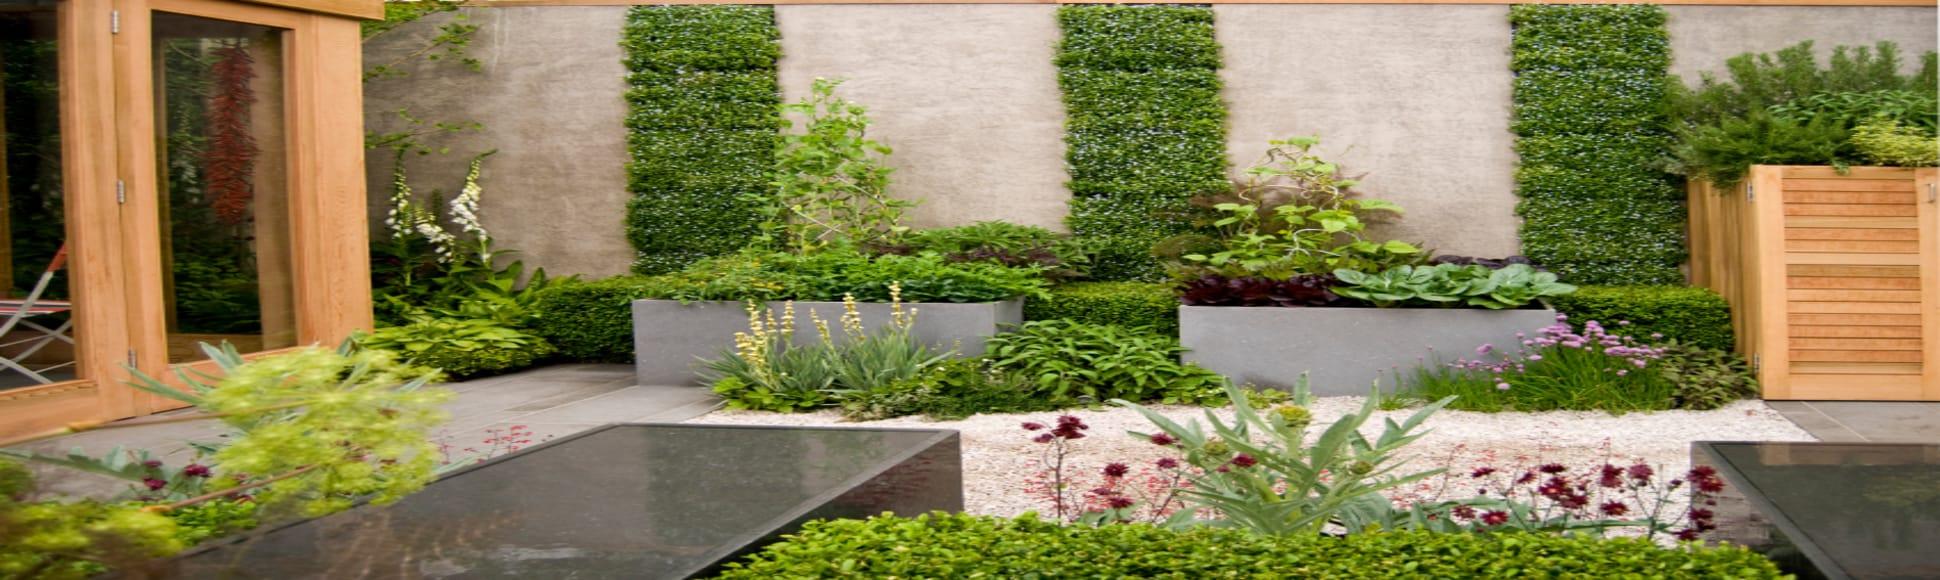 Landscape Design Hnd Associate Degree Course Online Online Diploma 2021